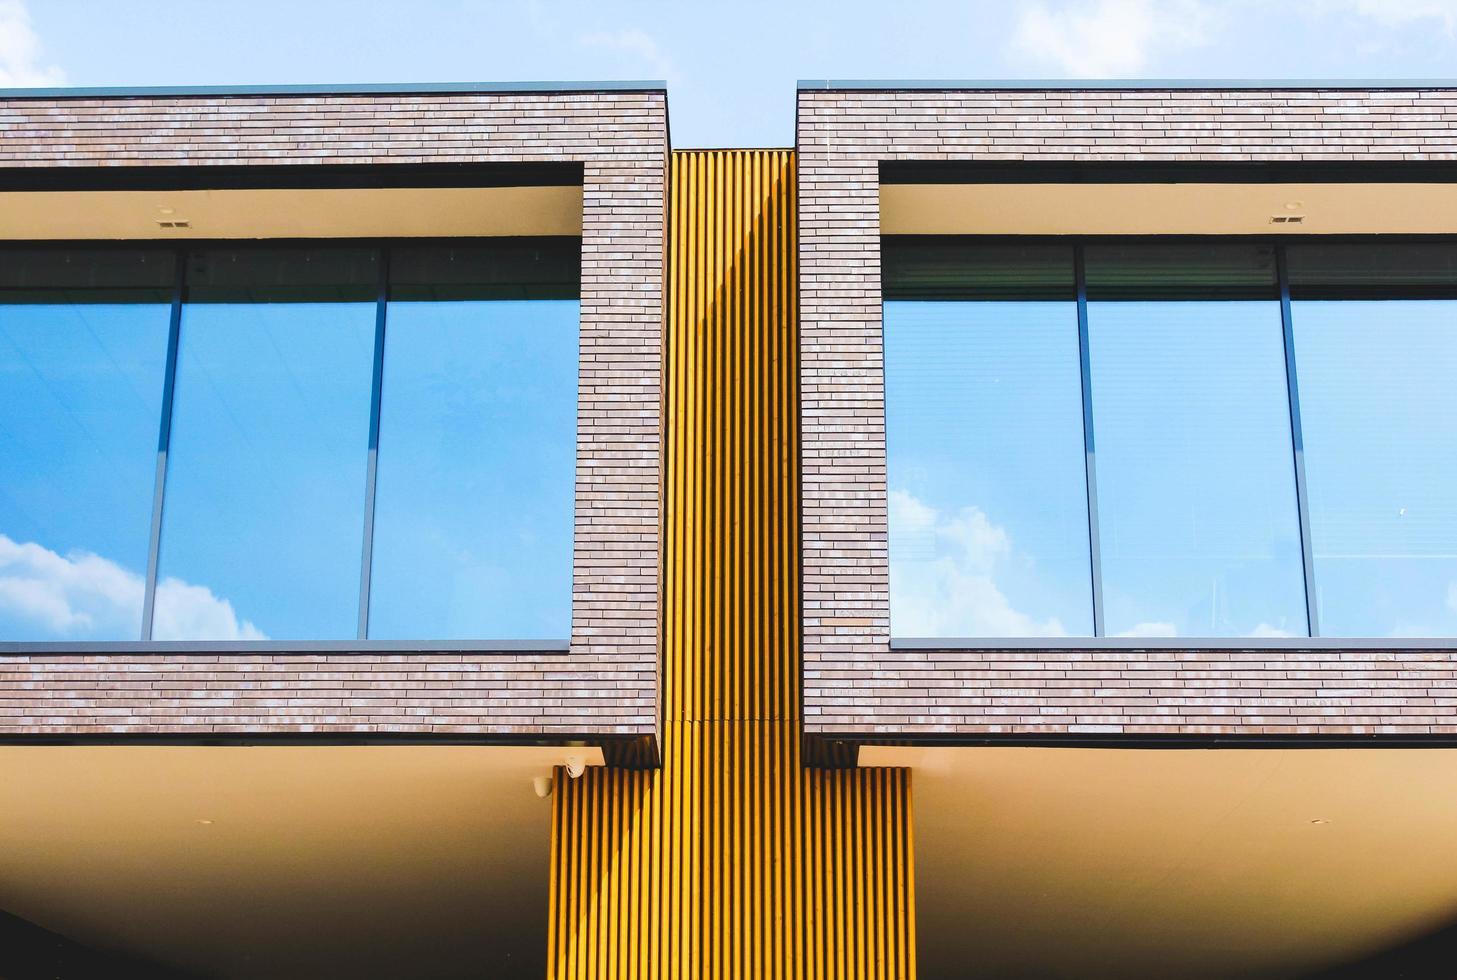 Holanda, 2020 - edificio geométrico moderno foto